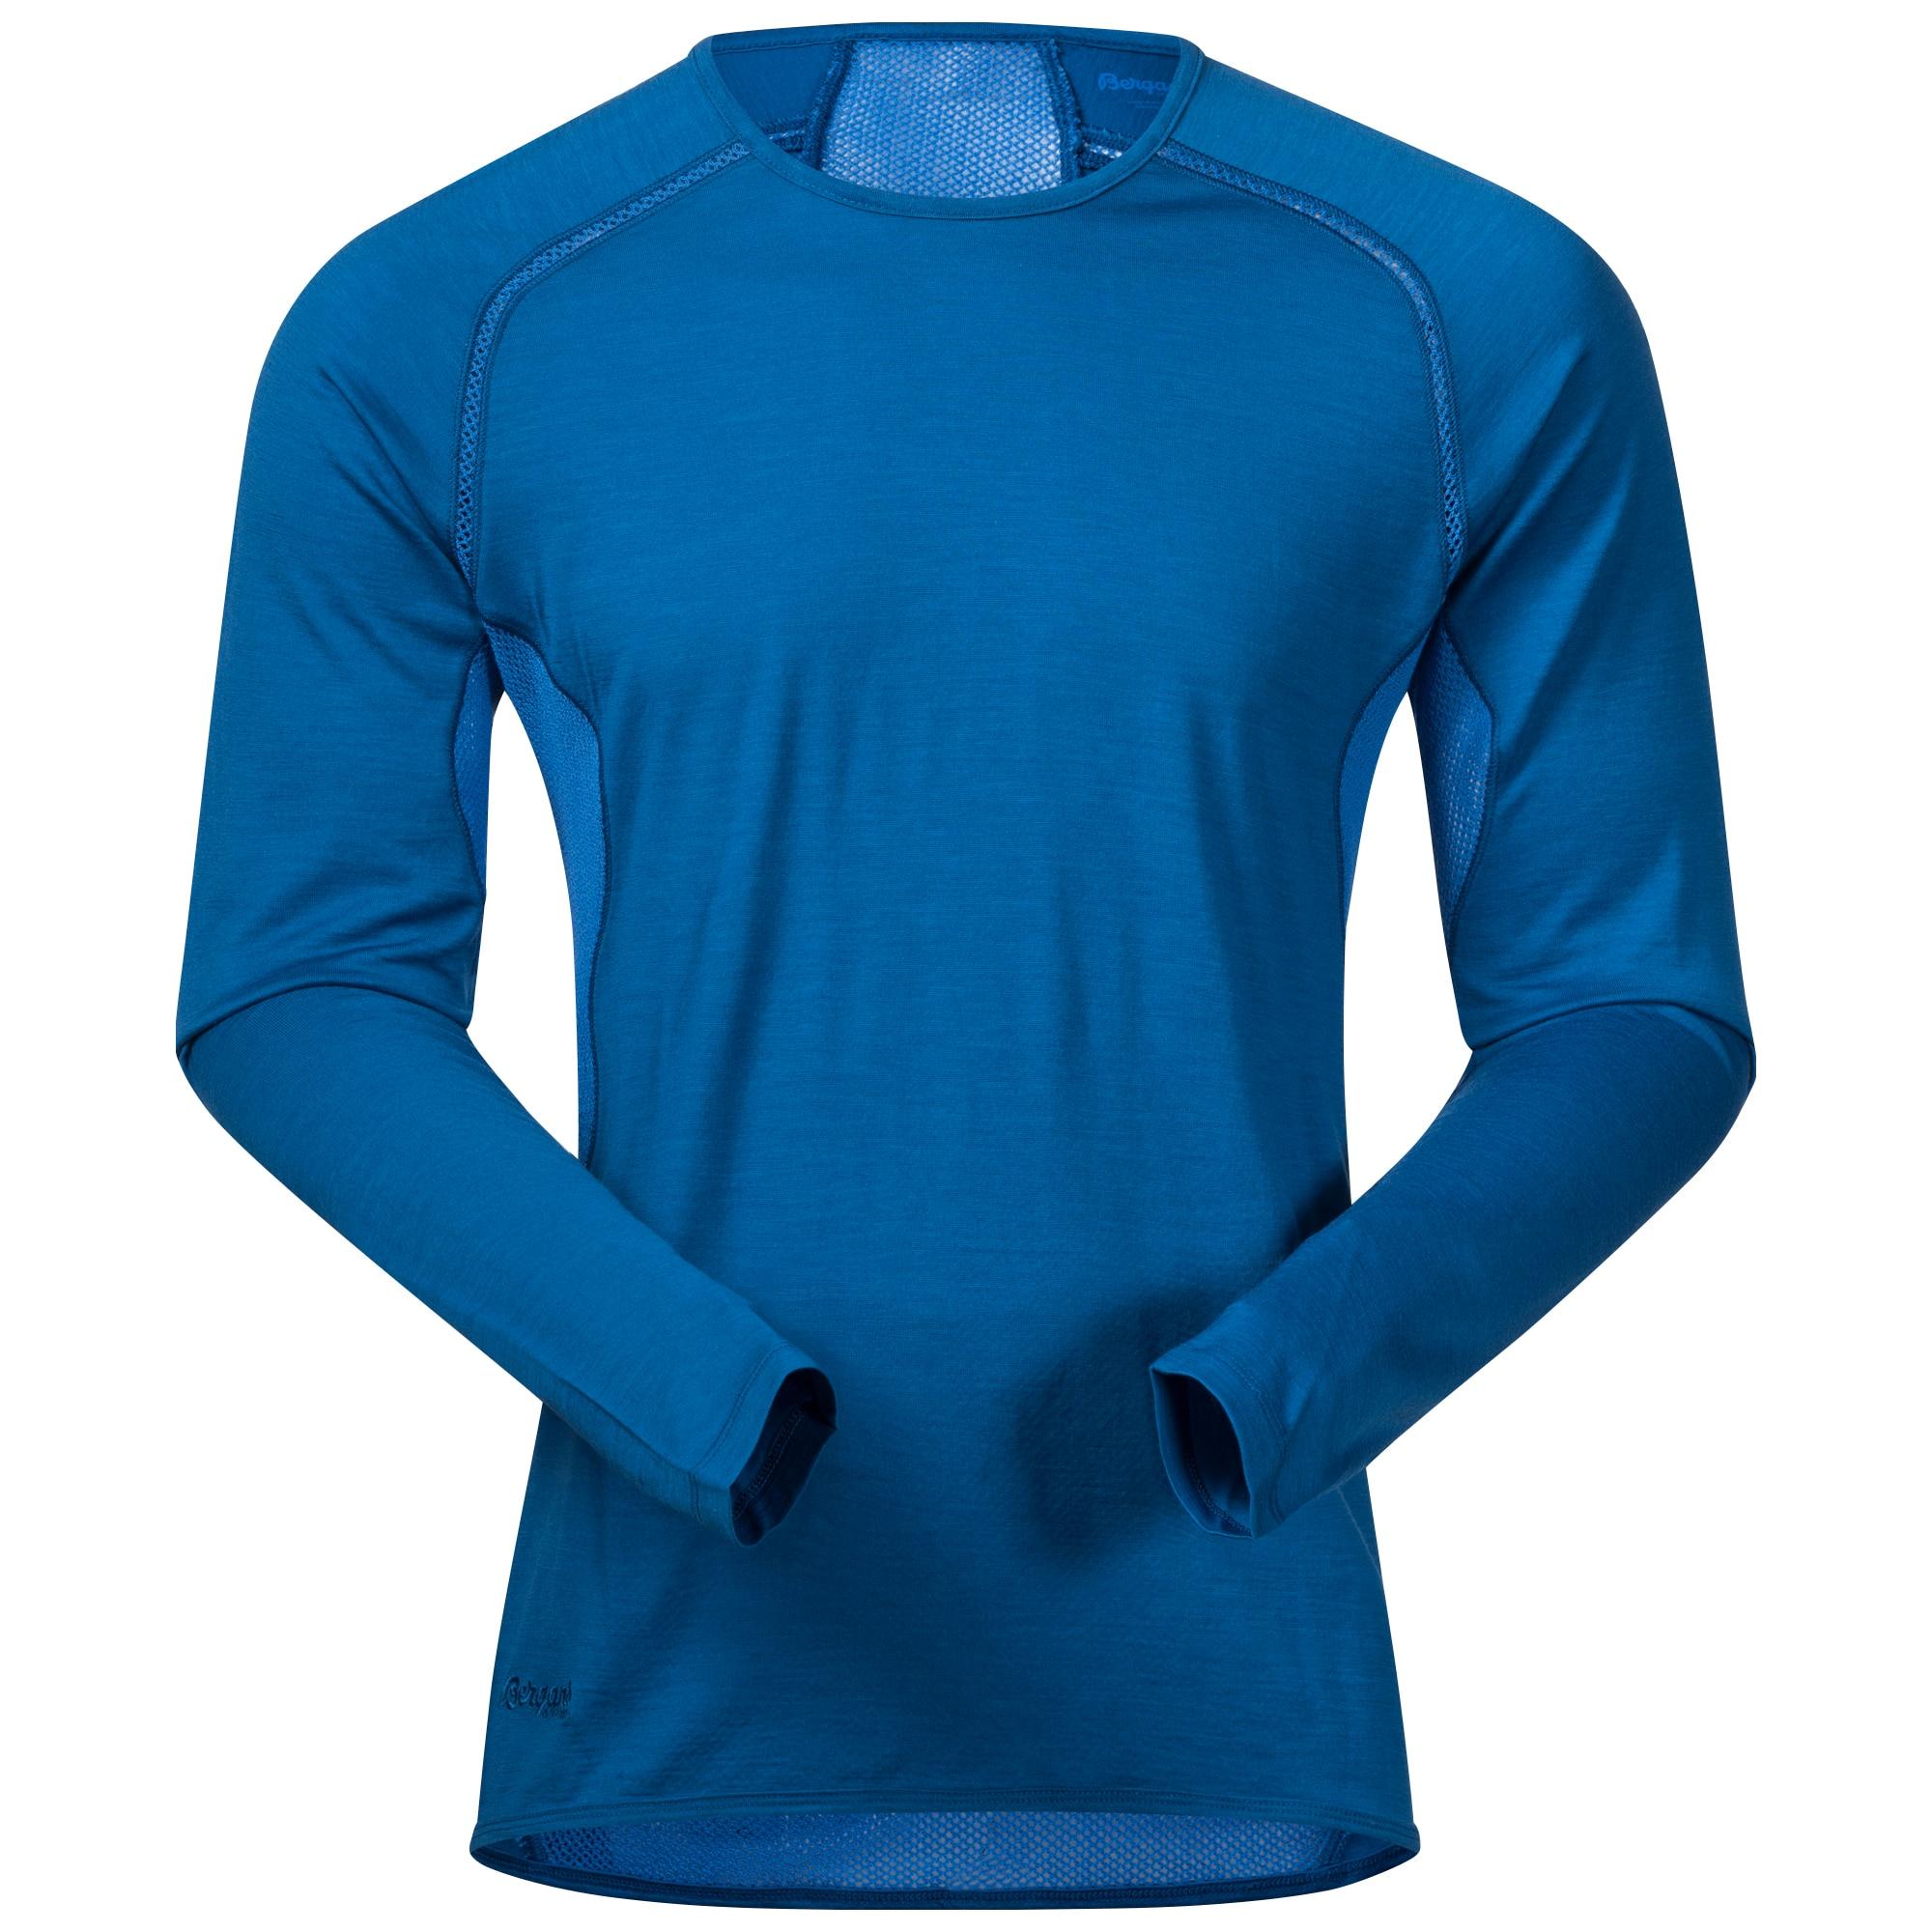 Barlind Shirt